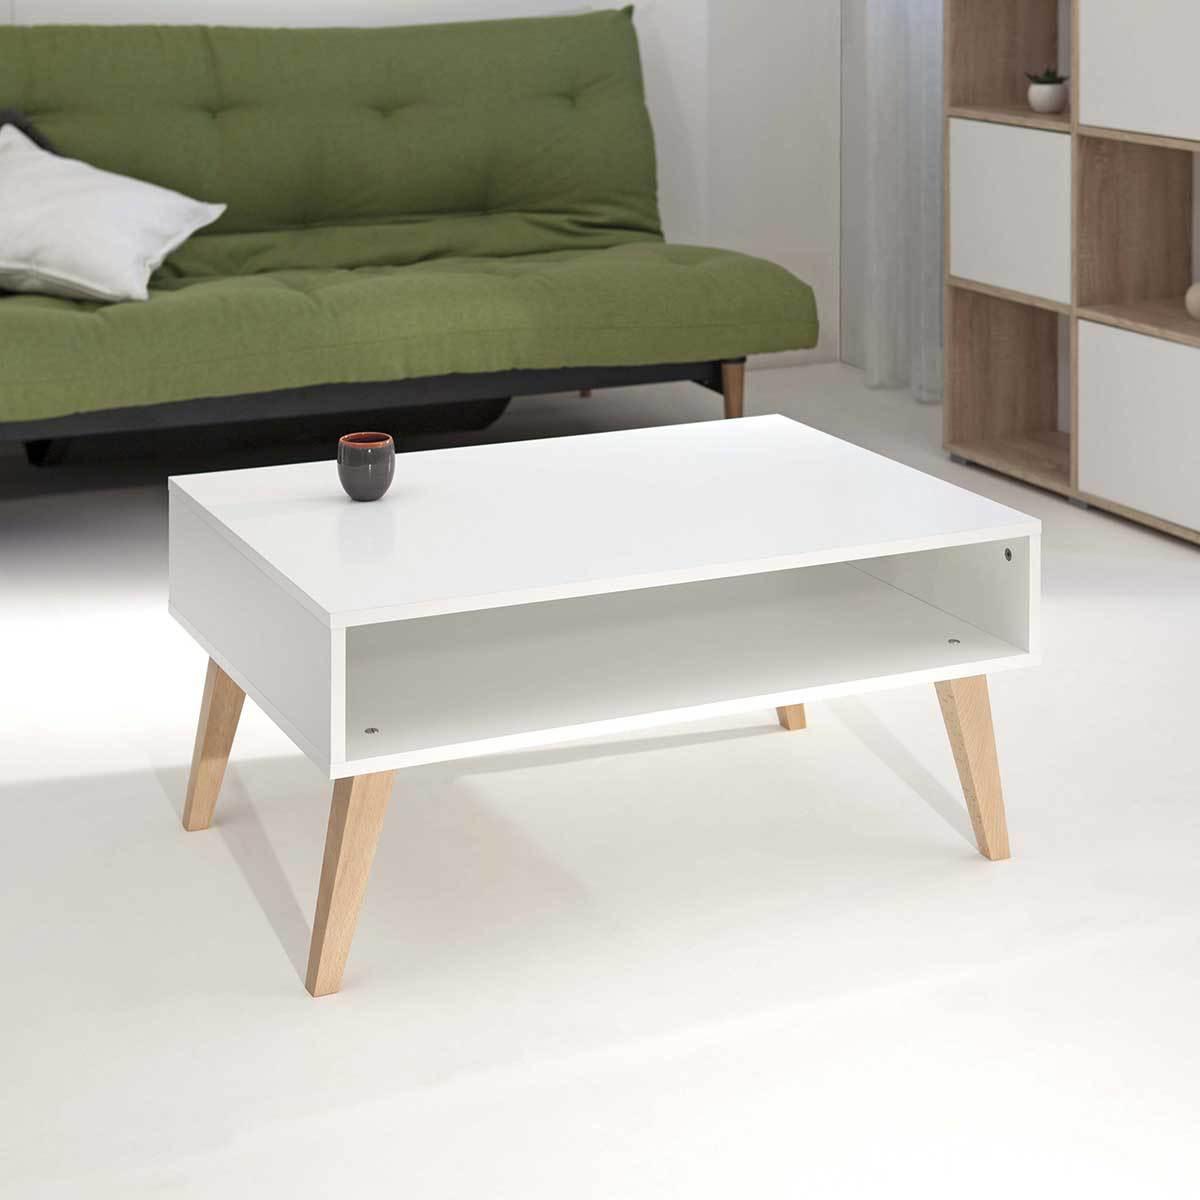 Table basse blanche pied en bois